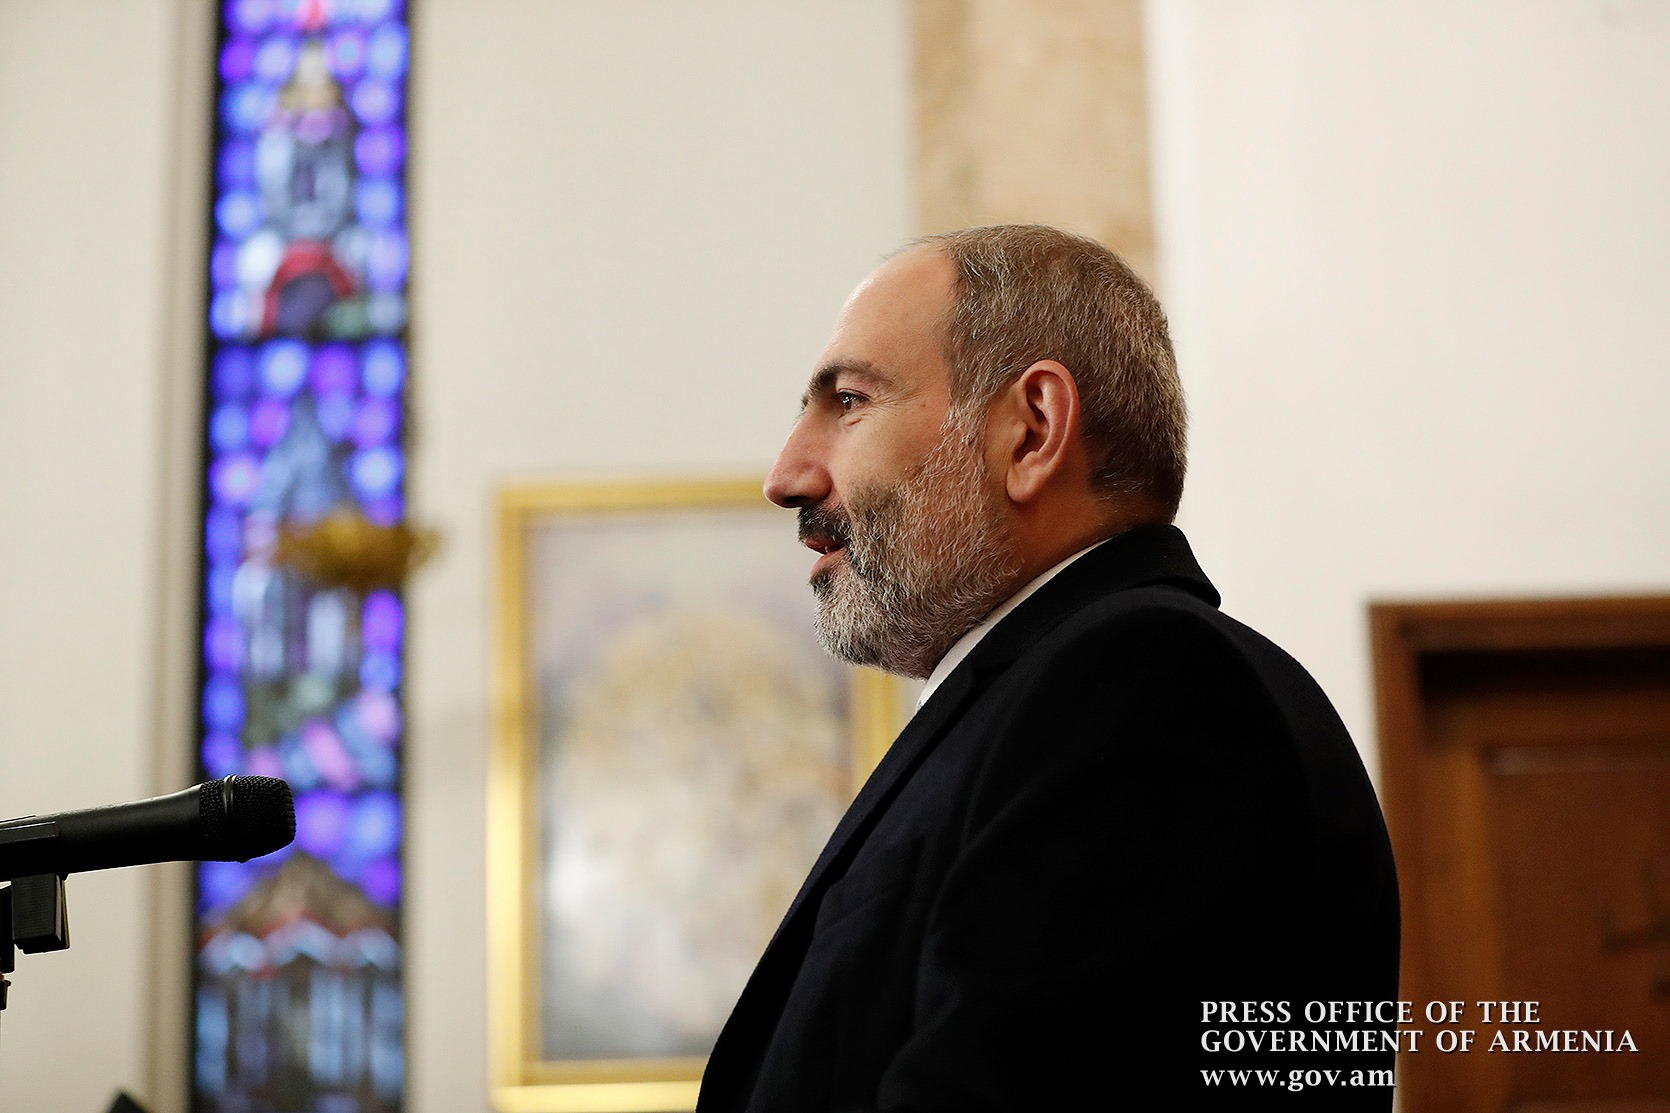 Армения, Карабах, Никол Пашинян, Роберт Кочарян, война в Карабахе, новости Армения,